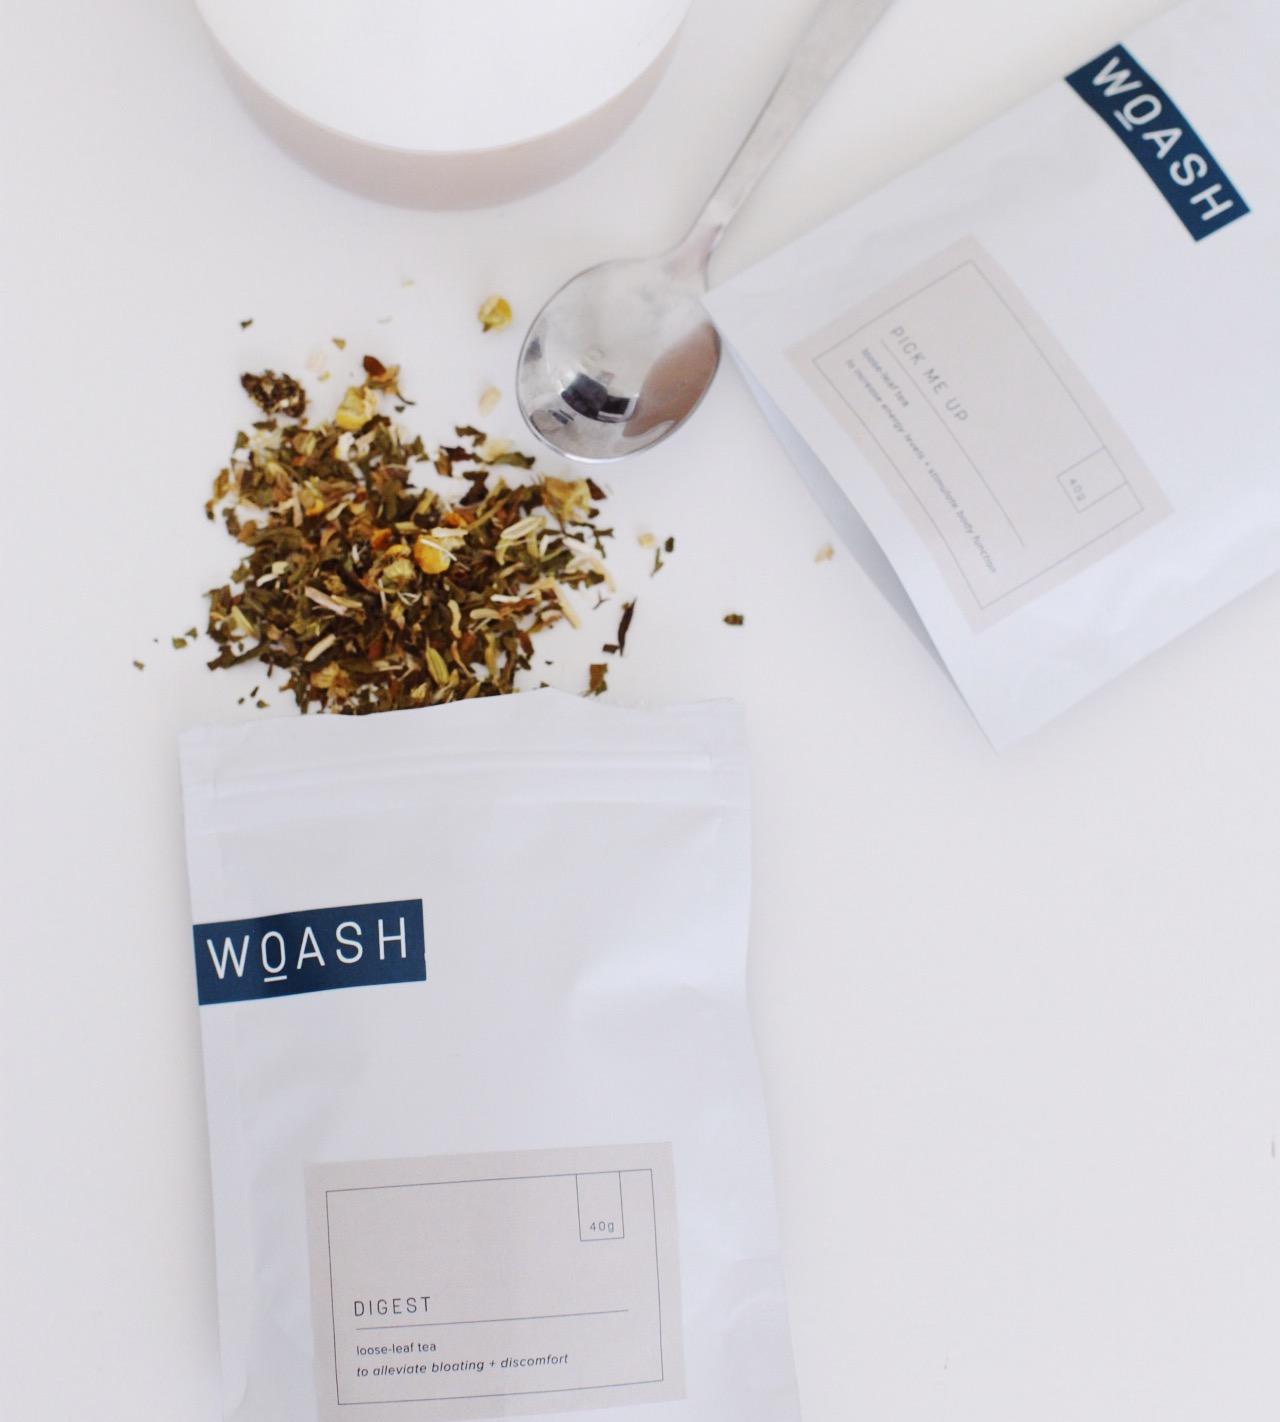 Packaging design for Woash Wellness by Salt Design Co.